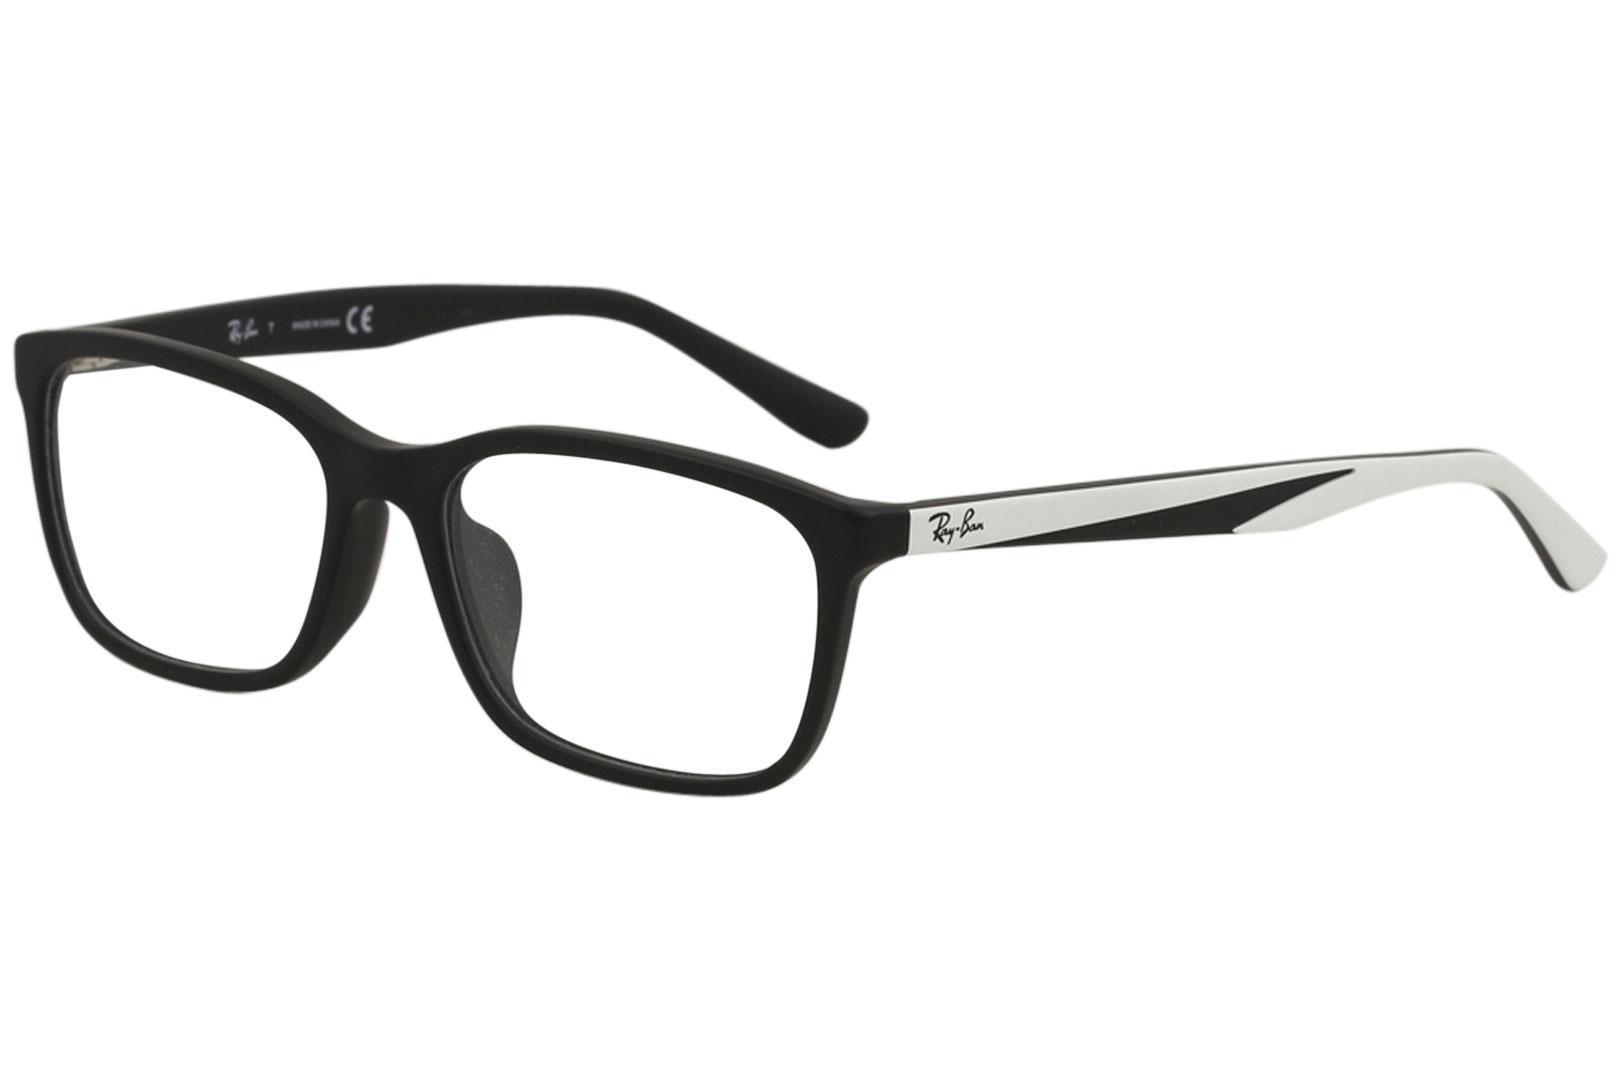 275e810eeb469 Ray Ban Men s Eyeglasses RX5336D RX 5336 D RayBan Full Rim Optical Frame by  Ray Ban